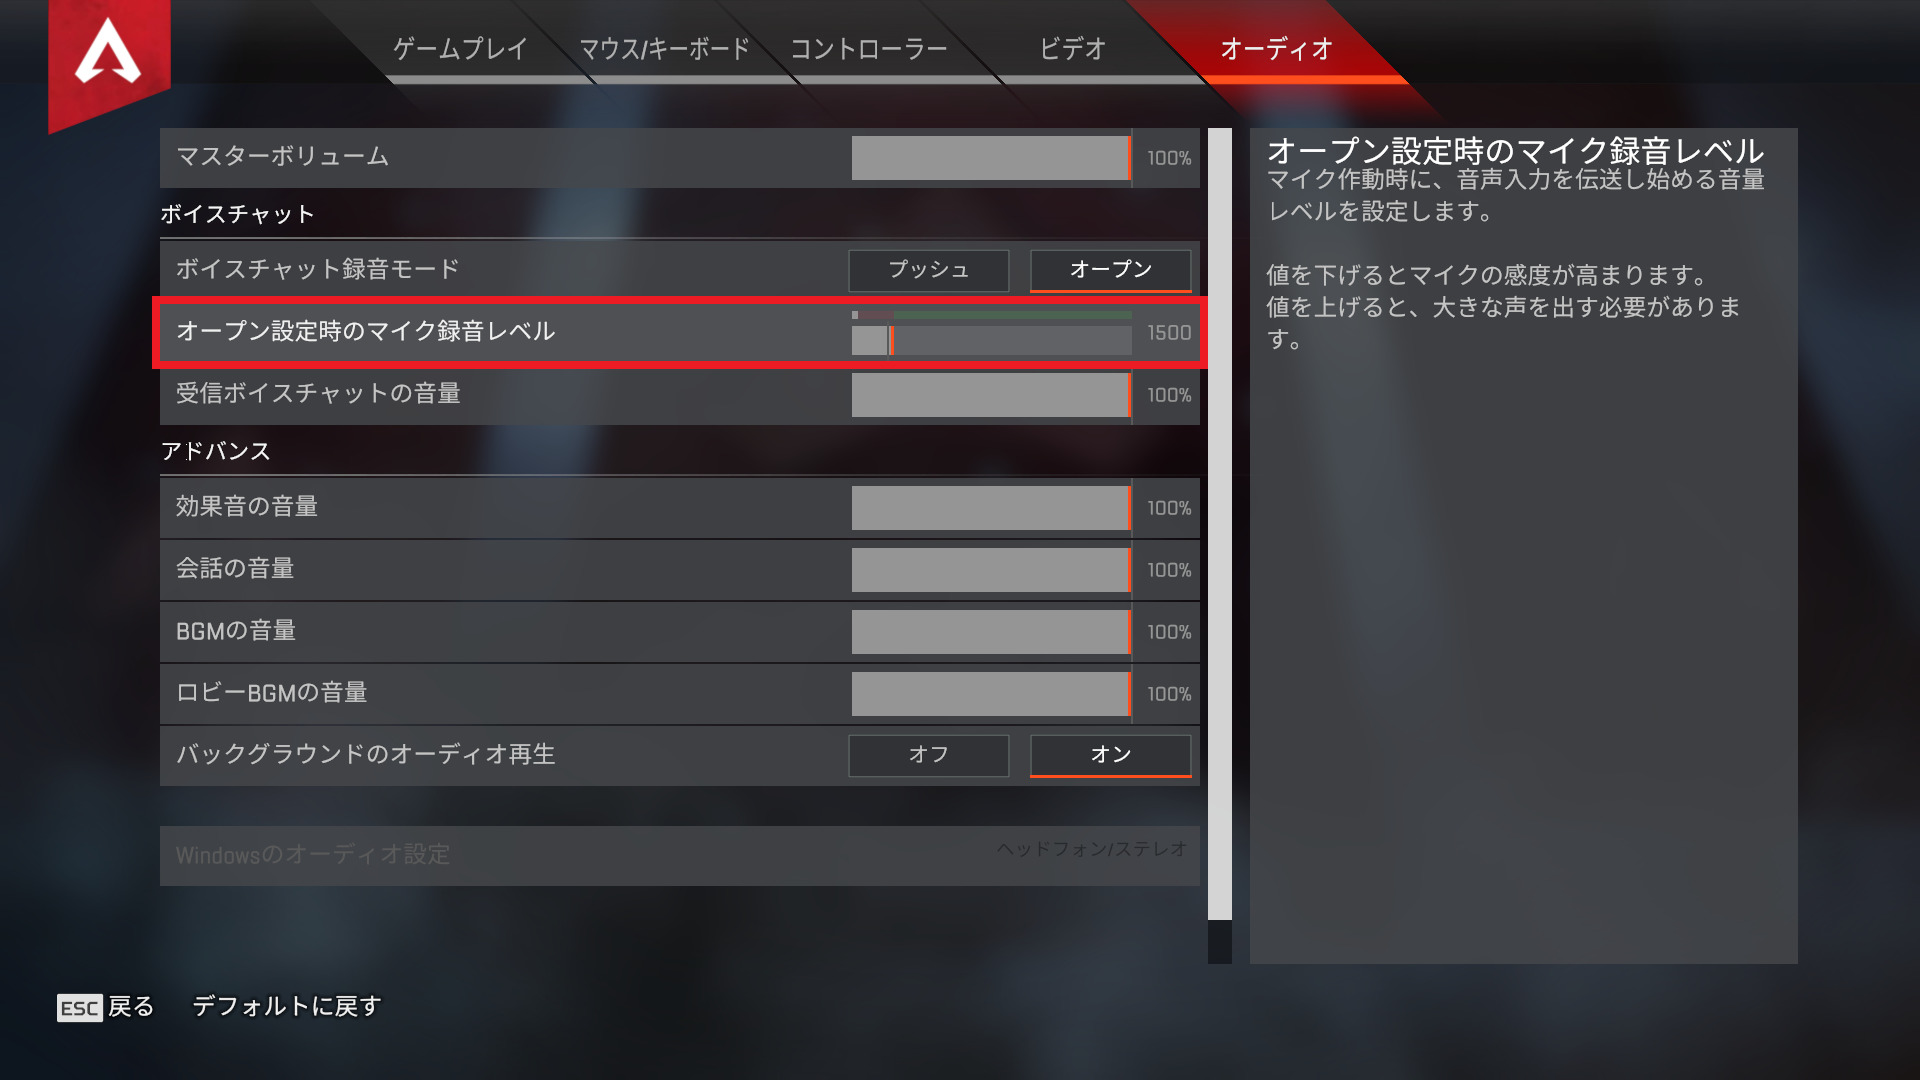 【Apex Legends】クロスプレイ中にゲーム内ボイスチャットの声が小さいと言われたときの対処法